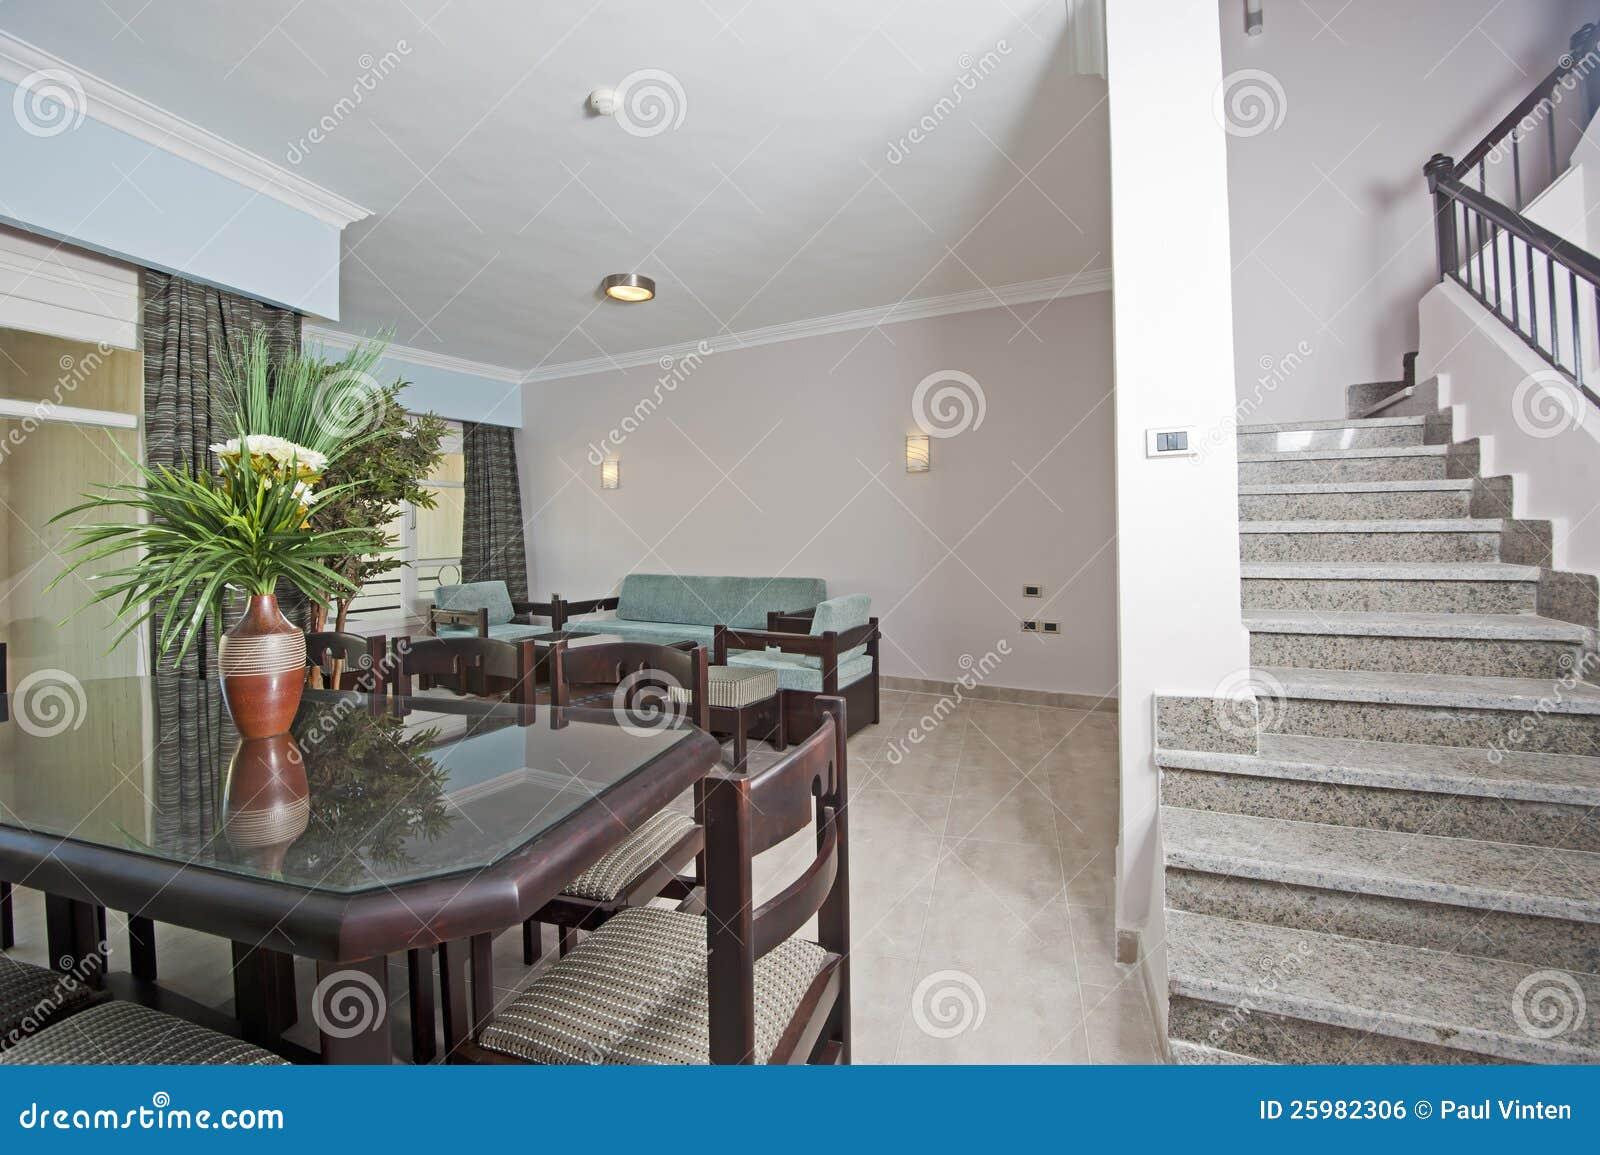 Luxury apartment interior design royalty free stock image image